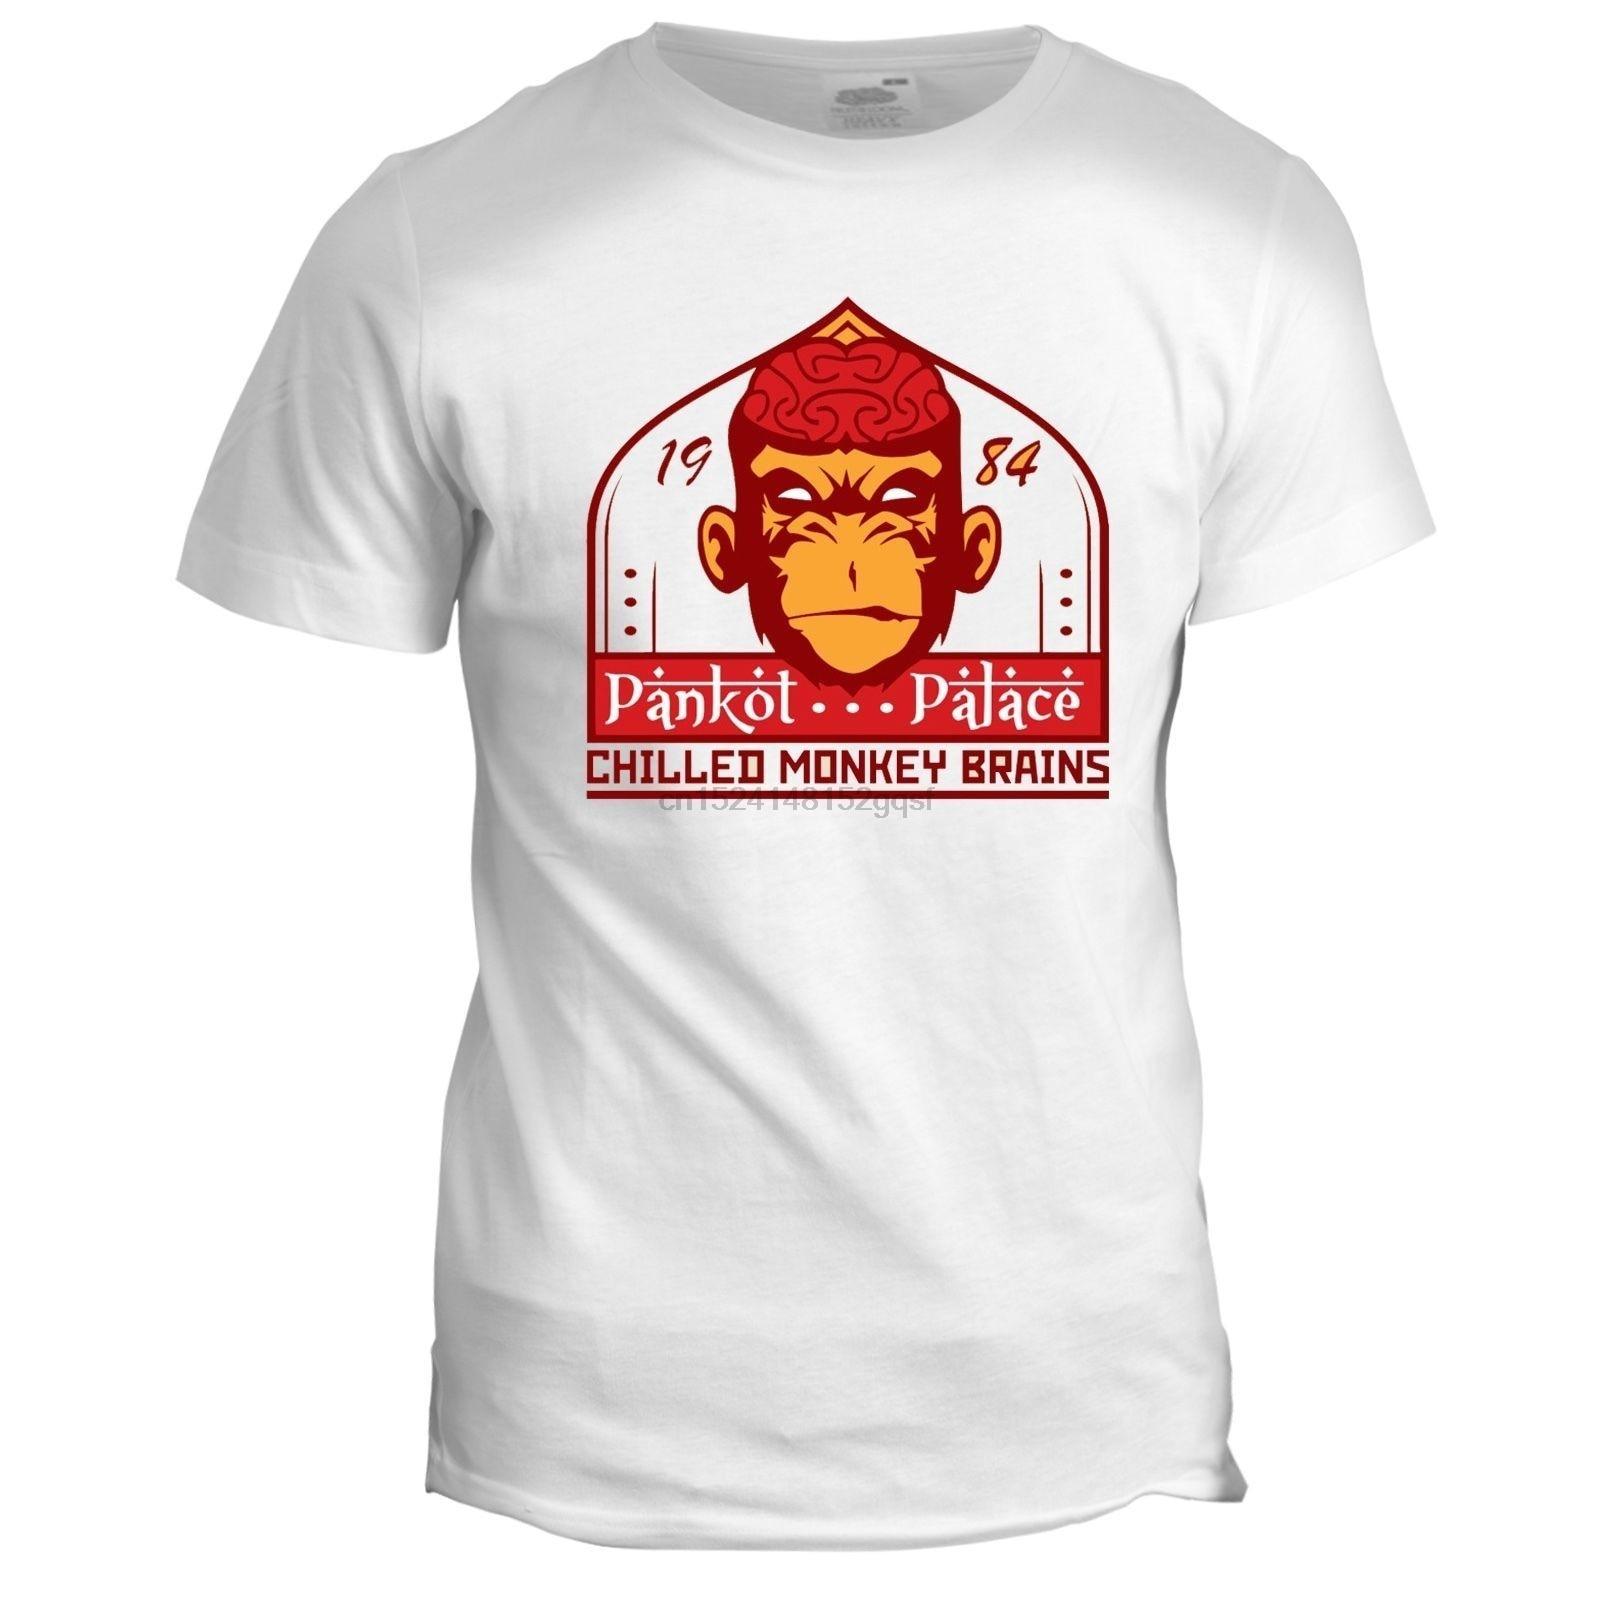 Chilled Monkey Brains Inspired Indiana Jones Movie Film 80s 90s T Shirt